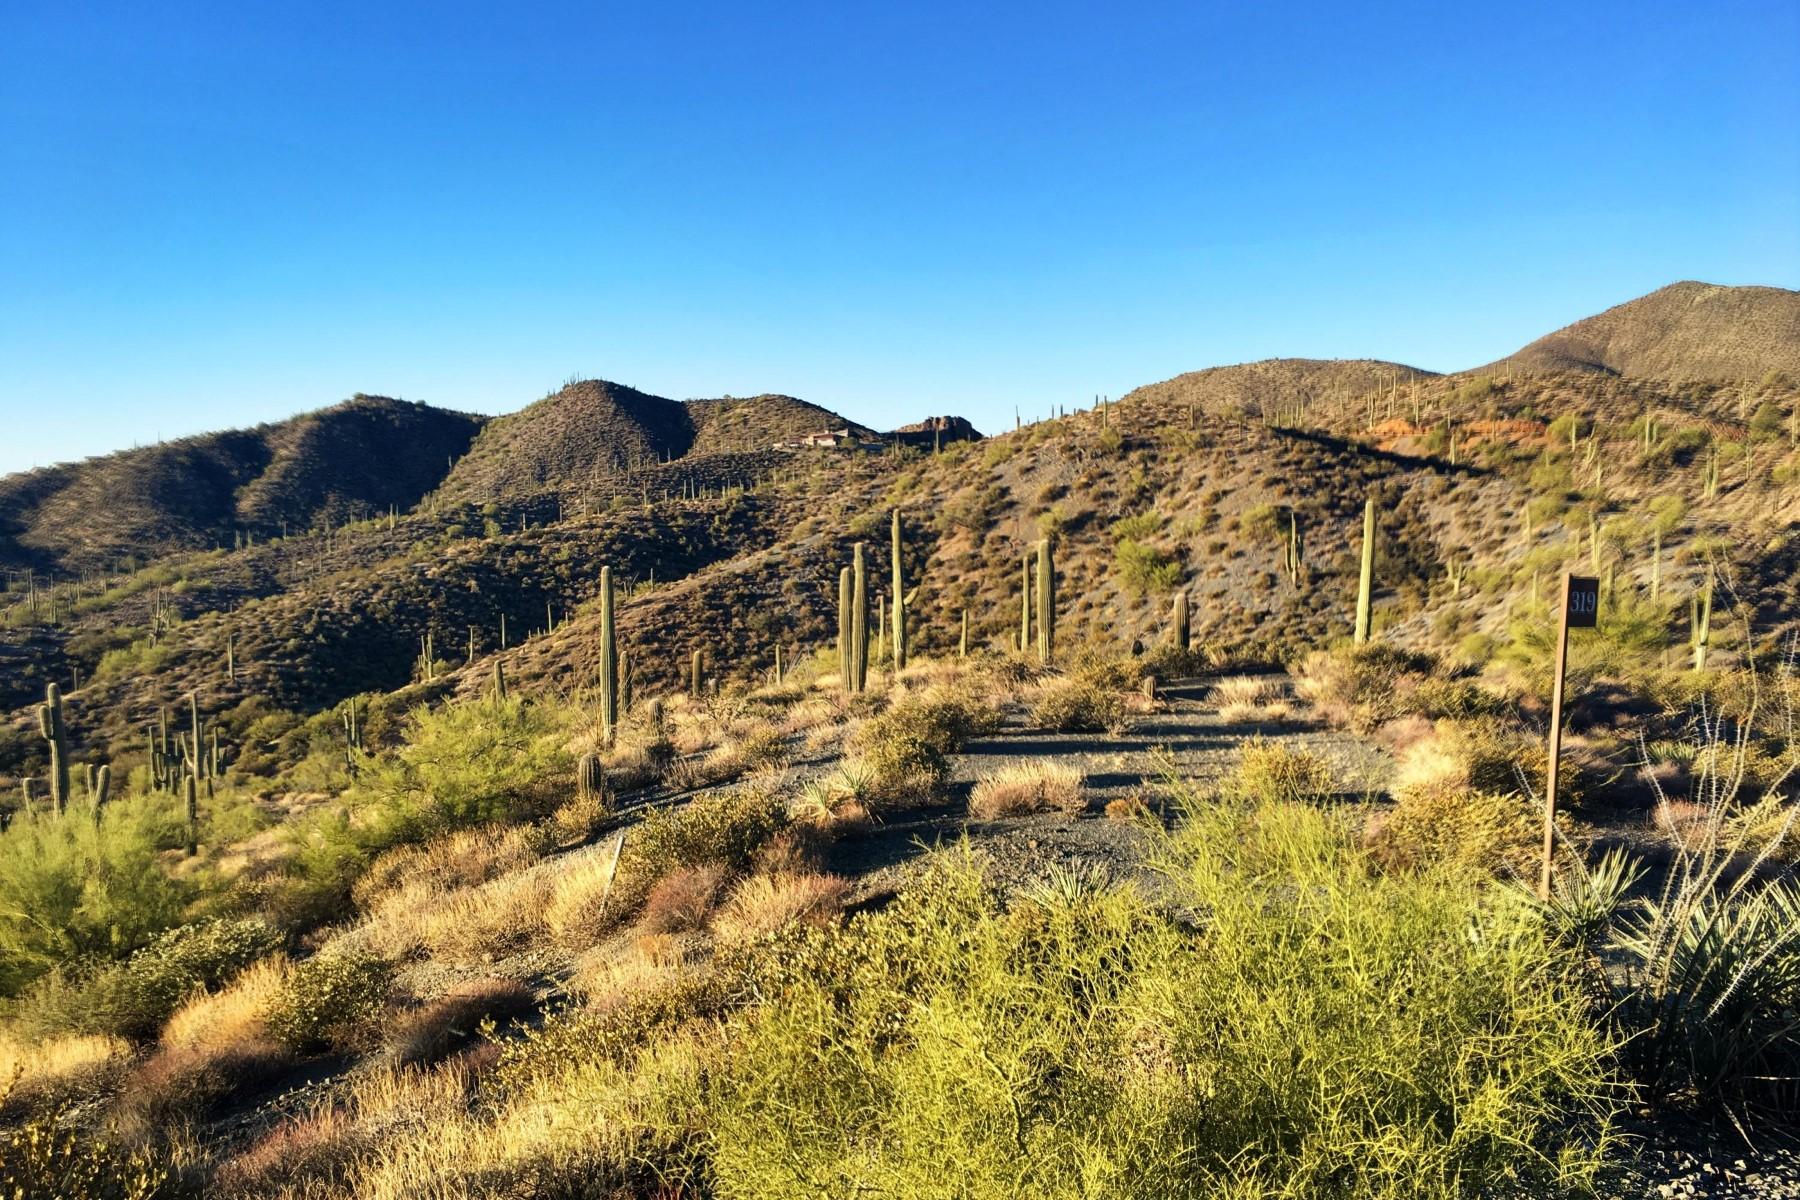 Terreno para Venda às Elevated and private view lot located in Desert Mountain 42558 N Chiricahua Pass #319 Scottsdale, Arizona, 85262 Estados Unidos